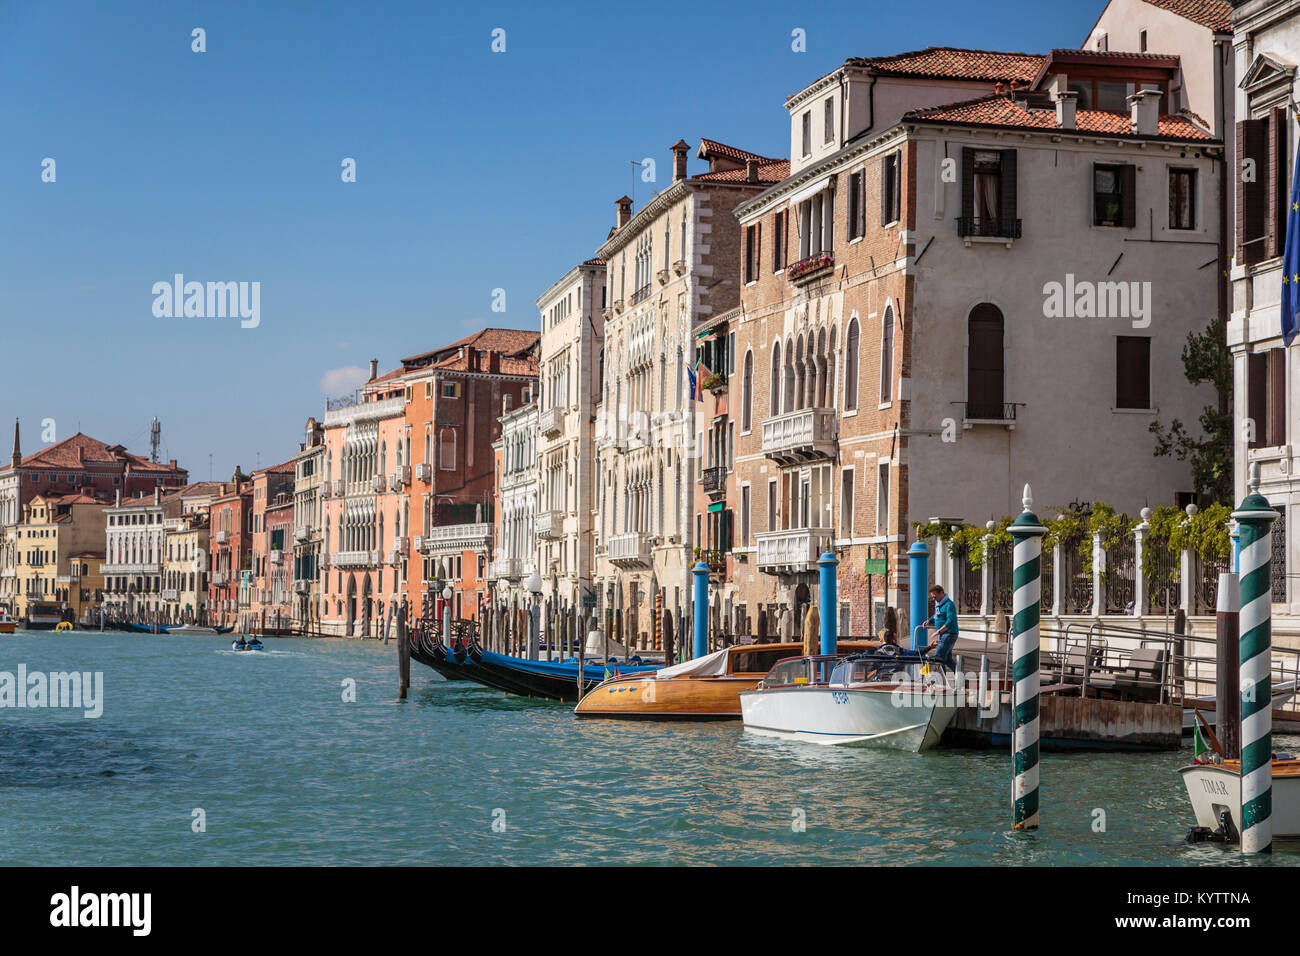 Gebäude und Boote entlang des Canal Grande in Veneto, Venedig, Italien, Europa, Stockbild